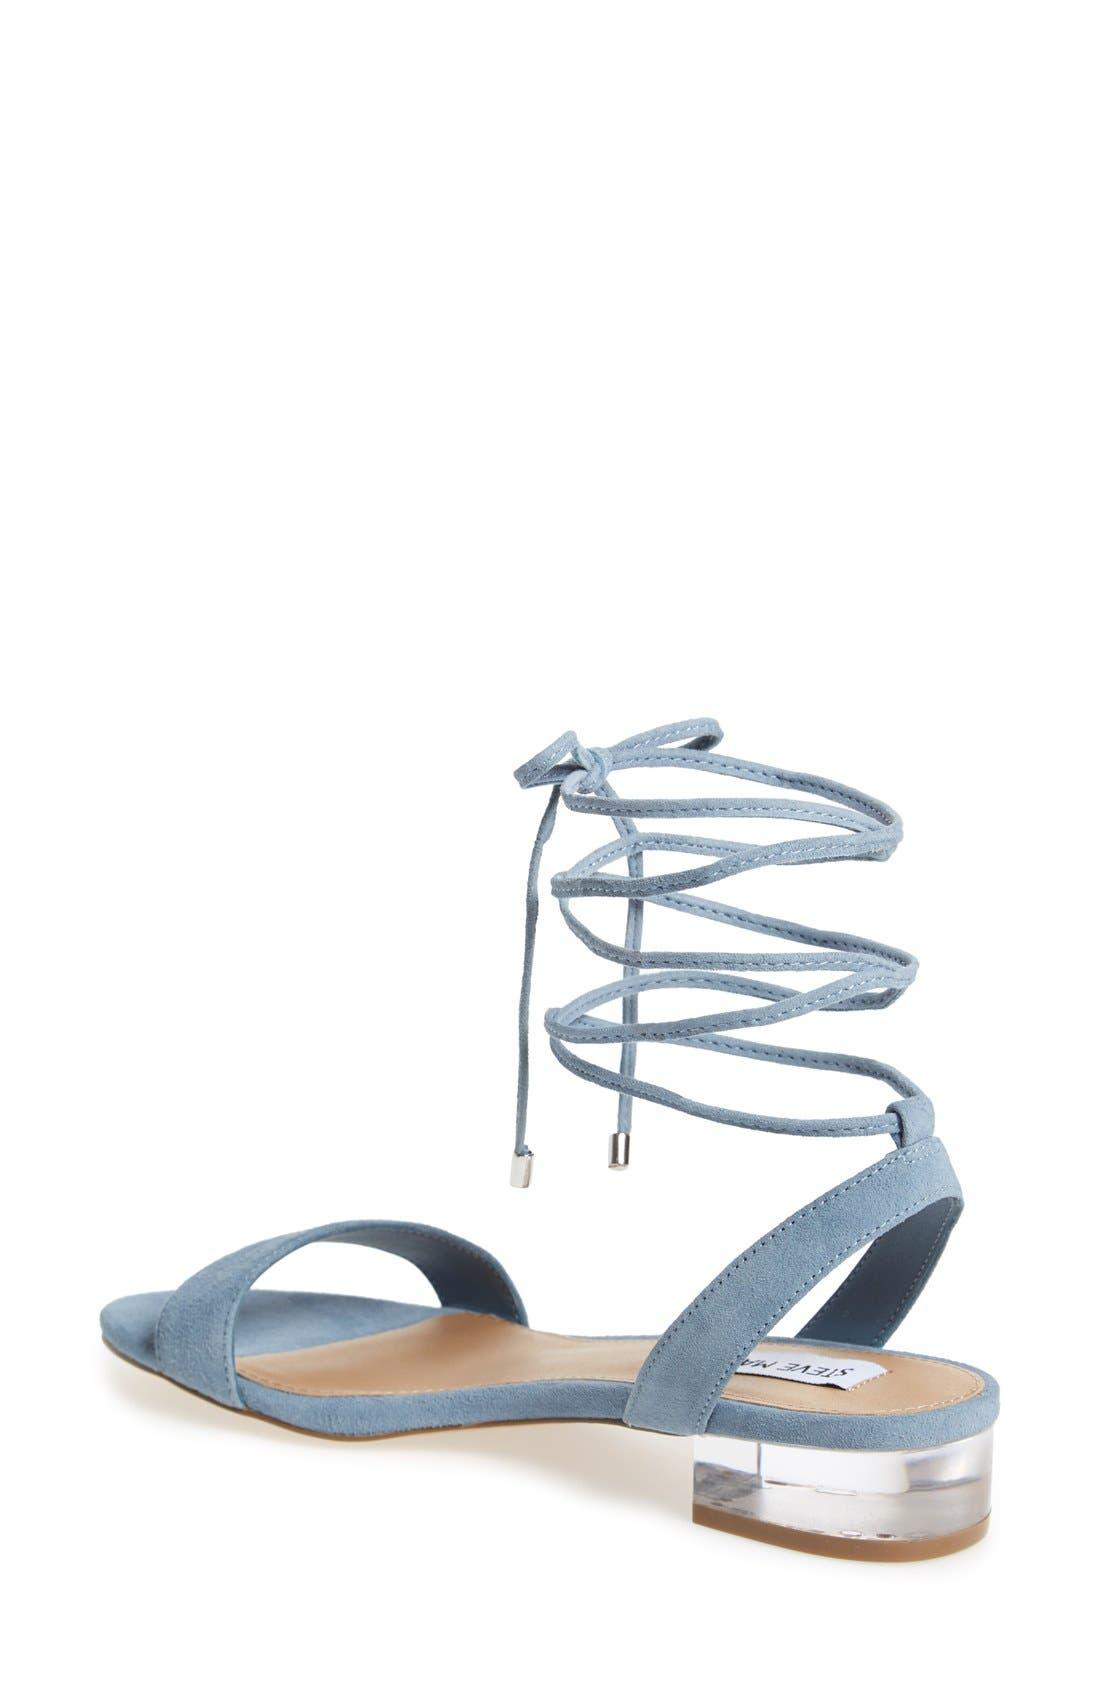 'Carolyn' Lace-Up Sandal,                             Alternate thumbnail 2, color,                             Blue Suede